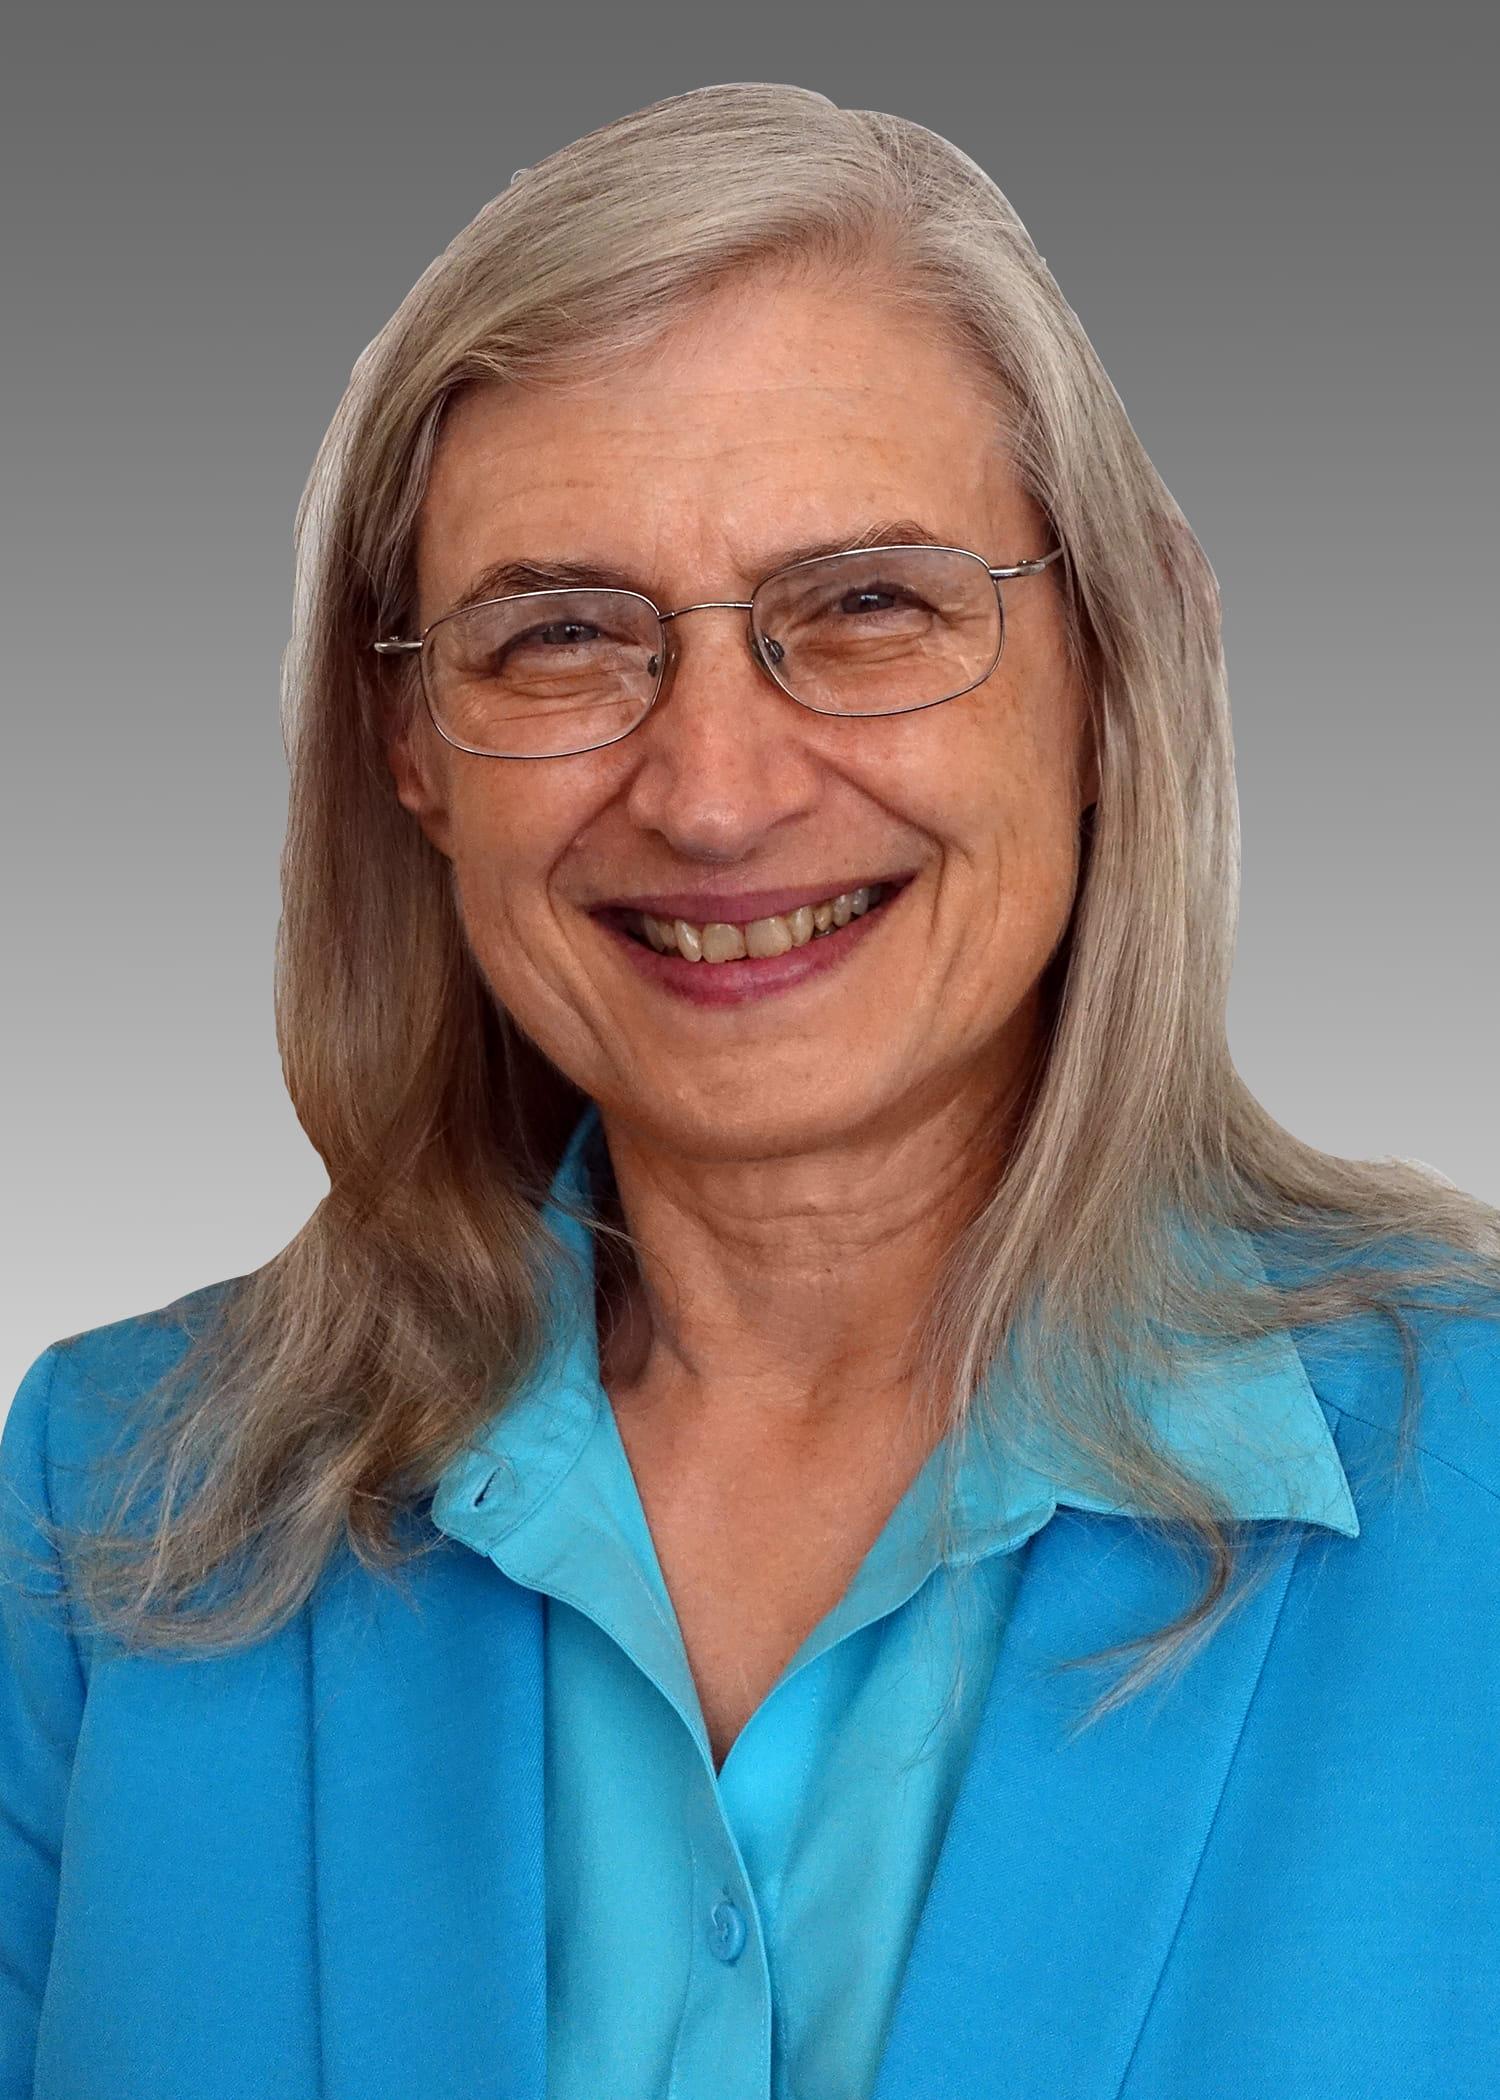 Dr. Kathy Hays-Stang